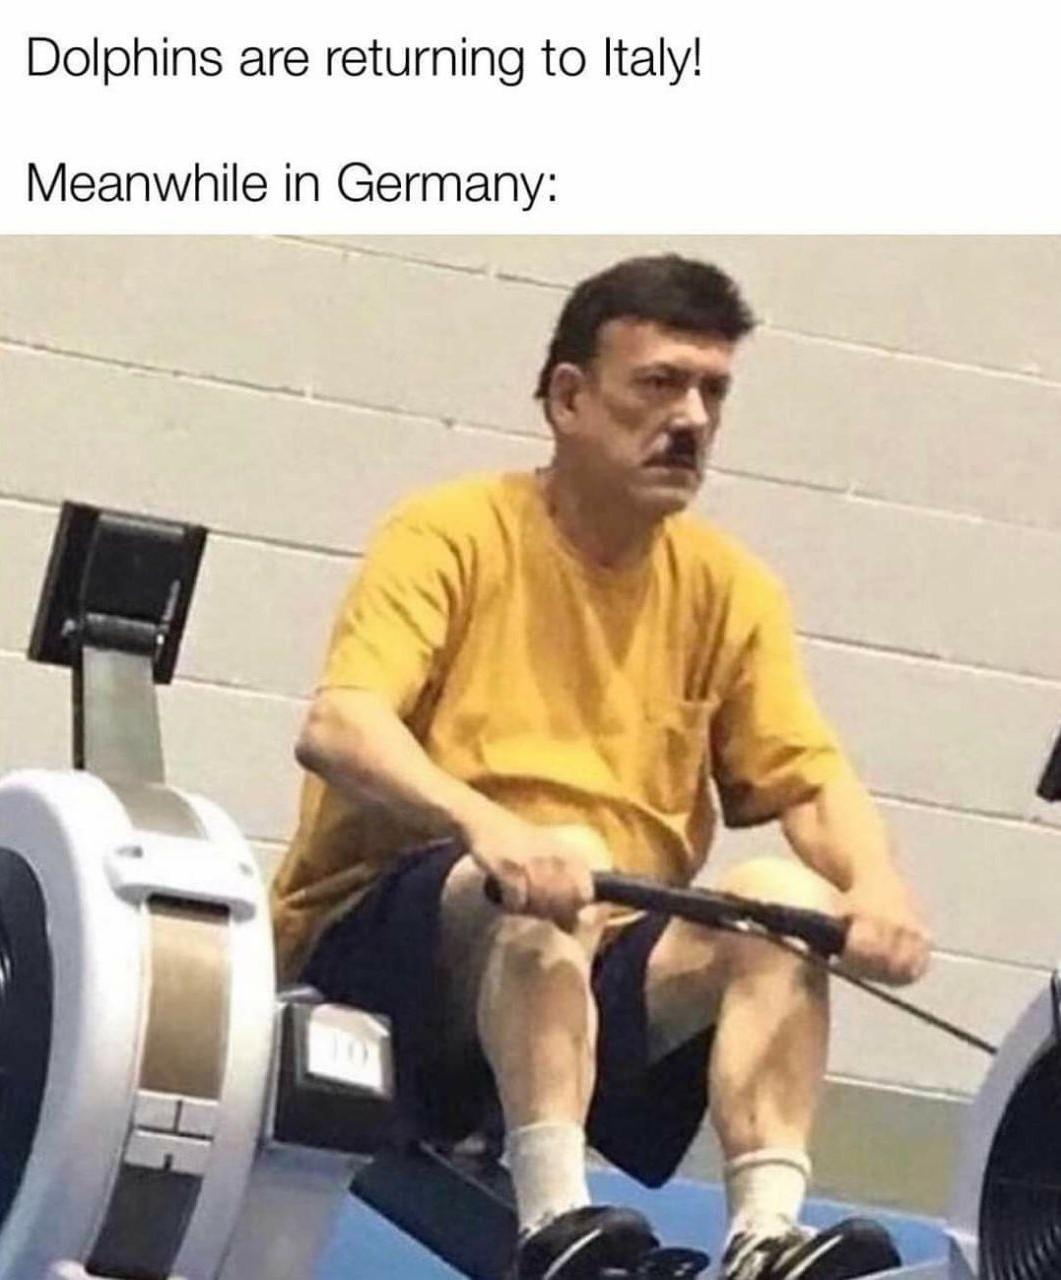 Heil! - meme